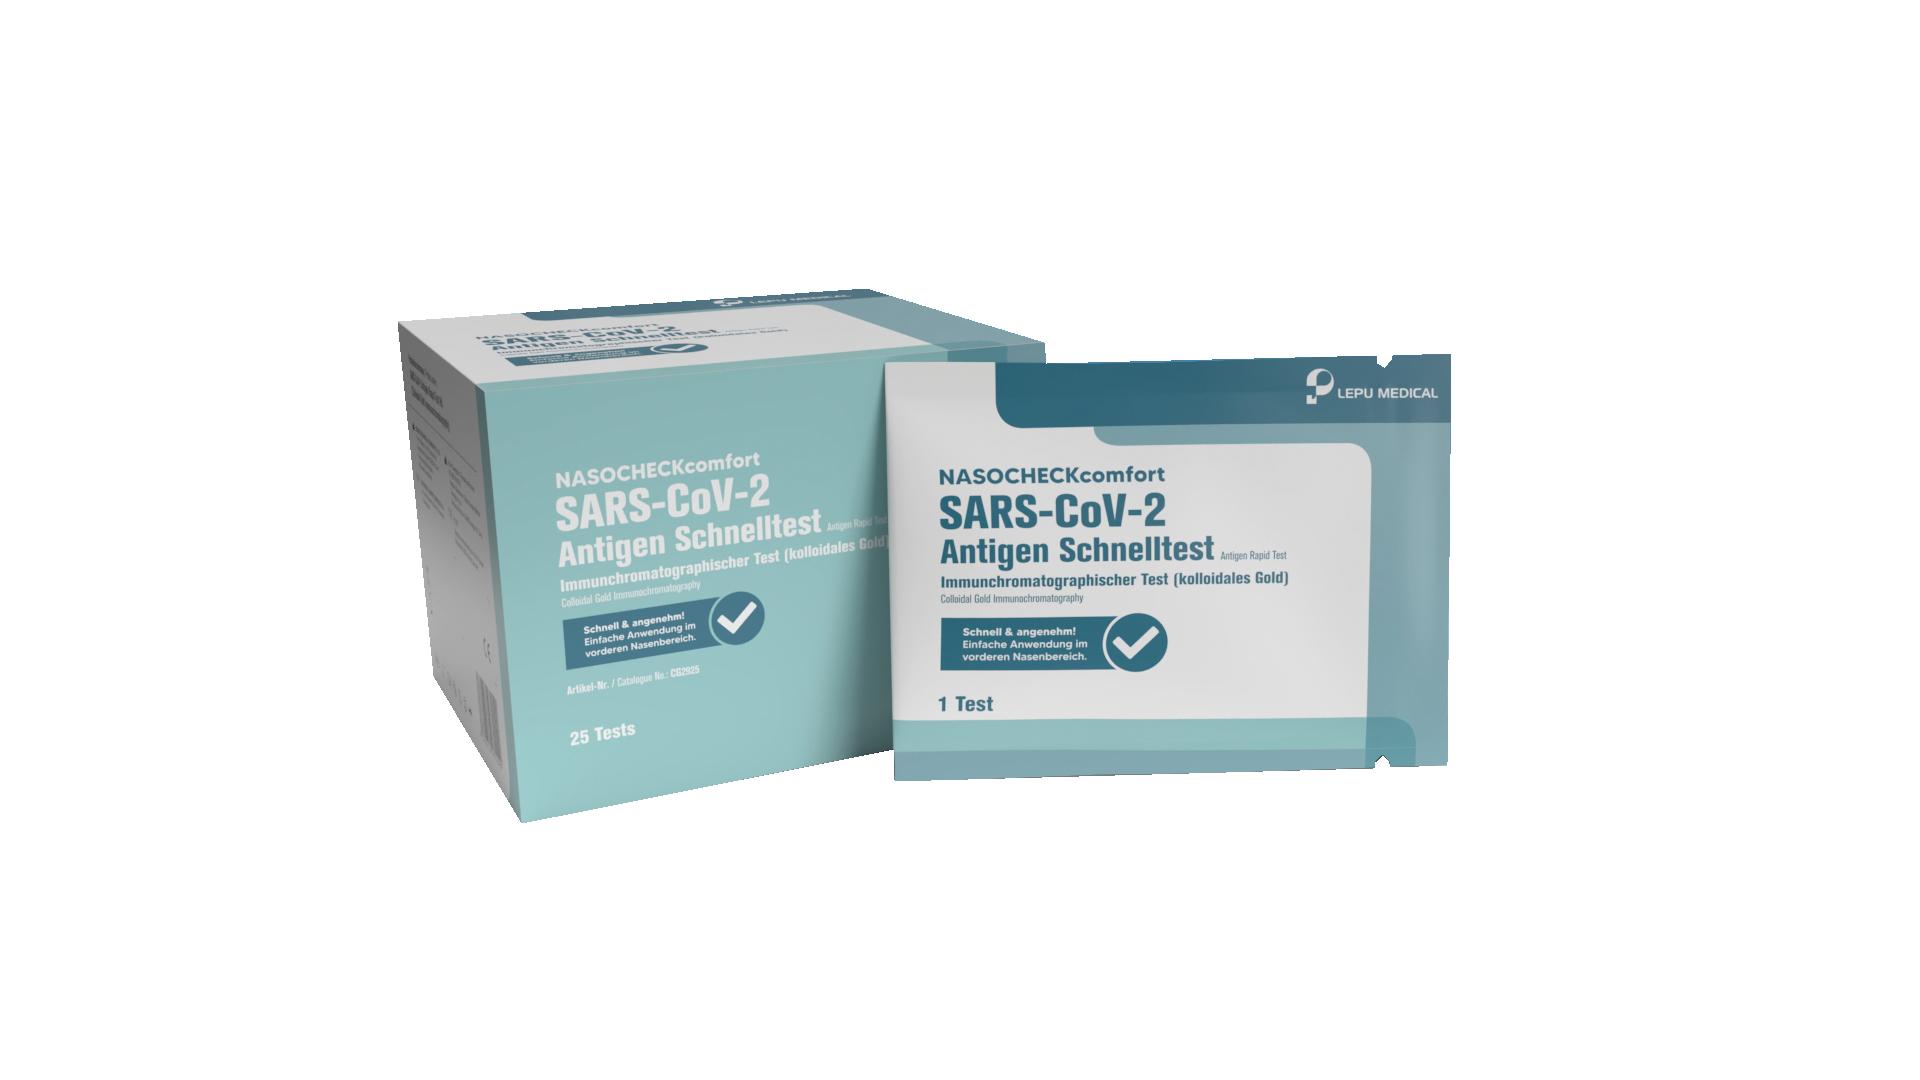 COVID - 19 AntiGen Schnelltest für Privat 25er Pack | LEPU Medical SARS-CoV-2